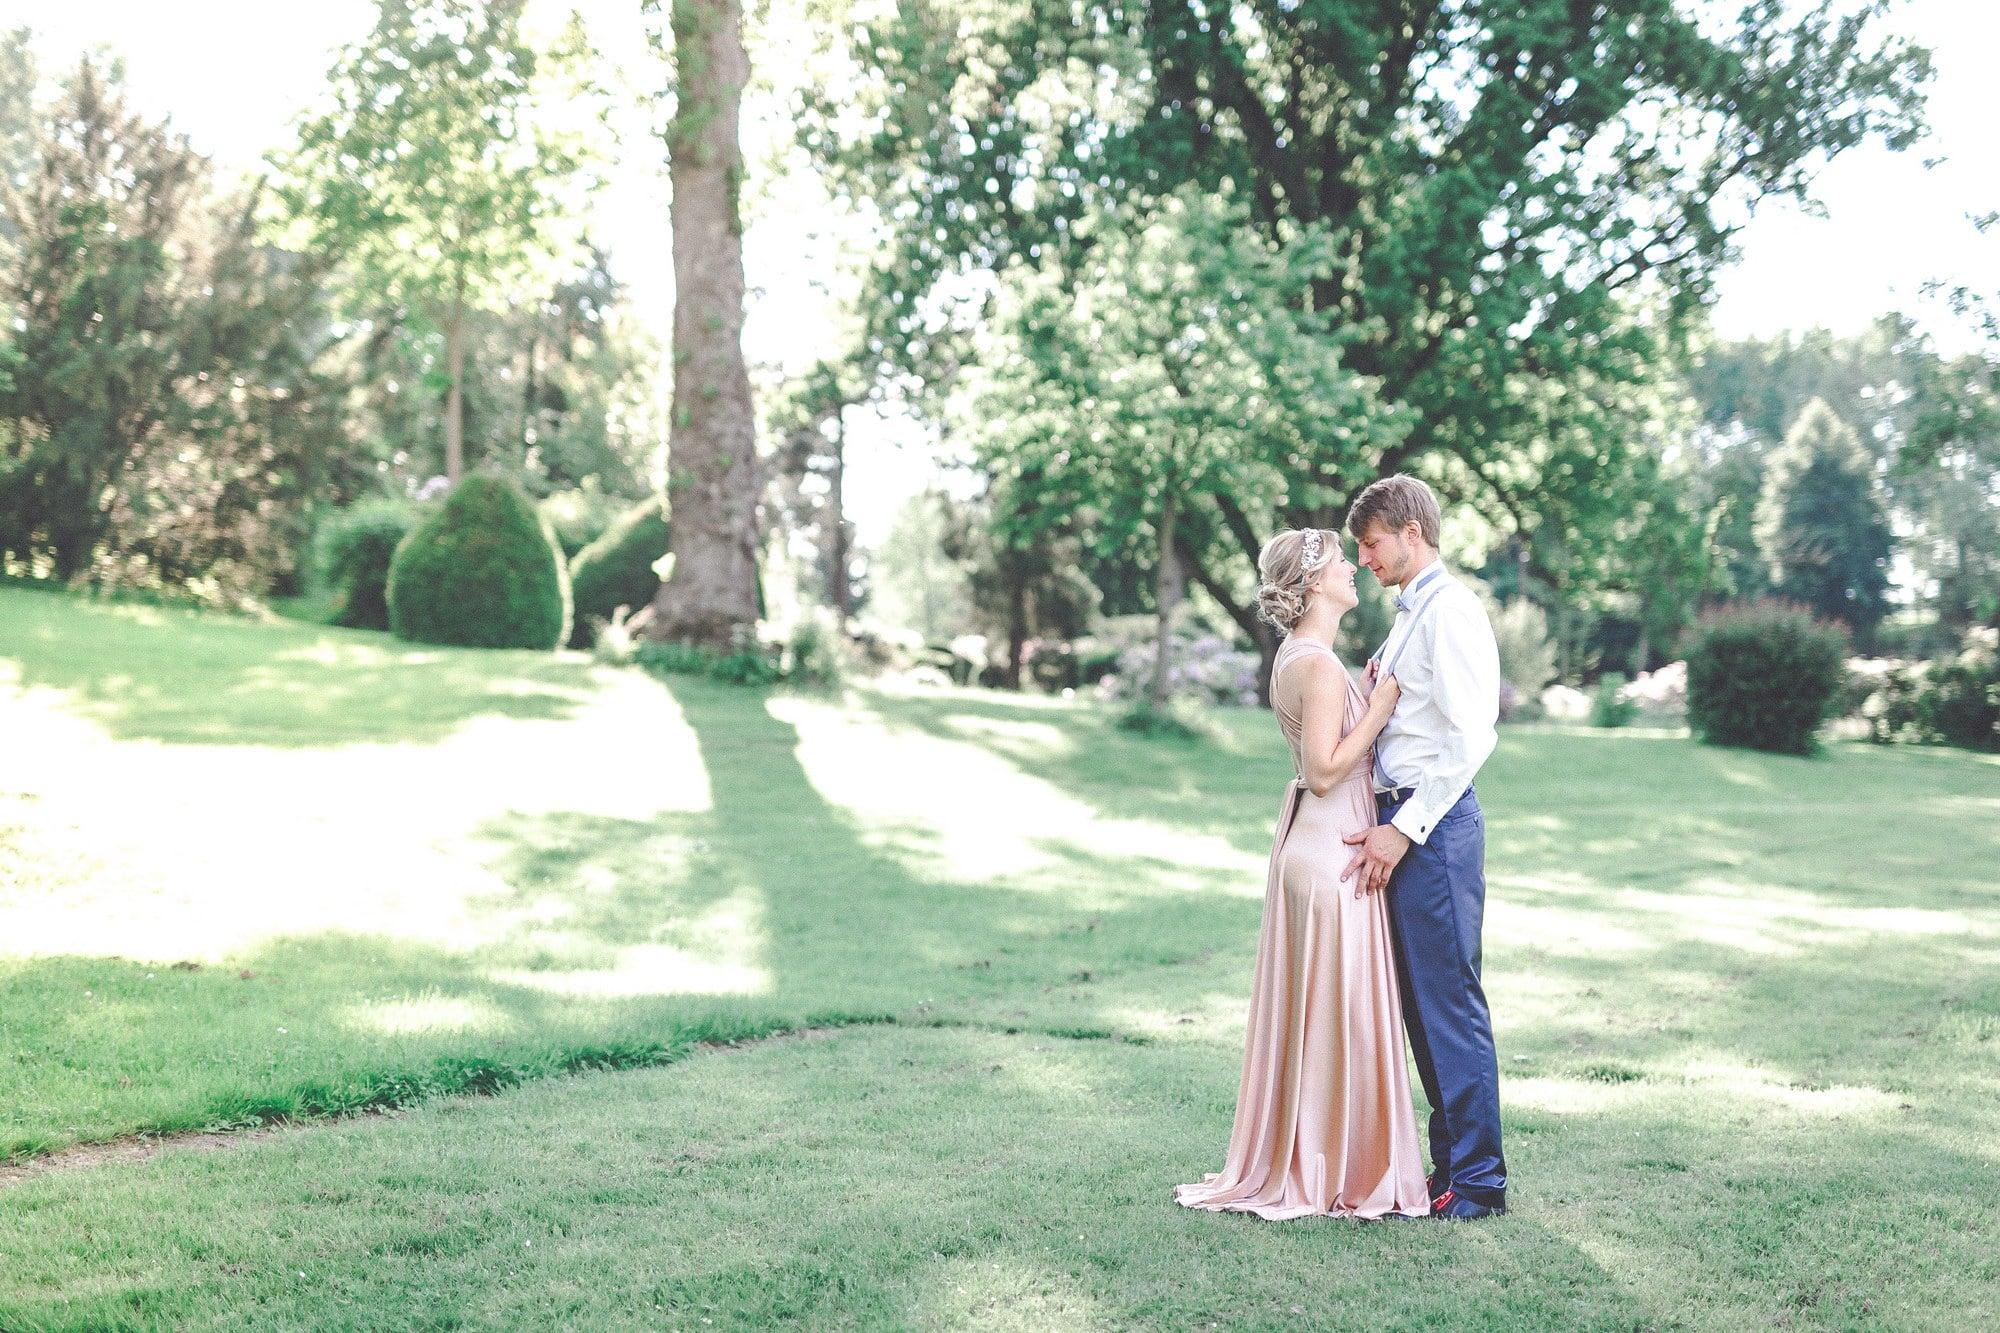 Wiese Bäume Mann Frau Wedding